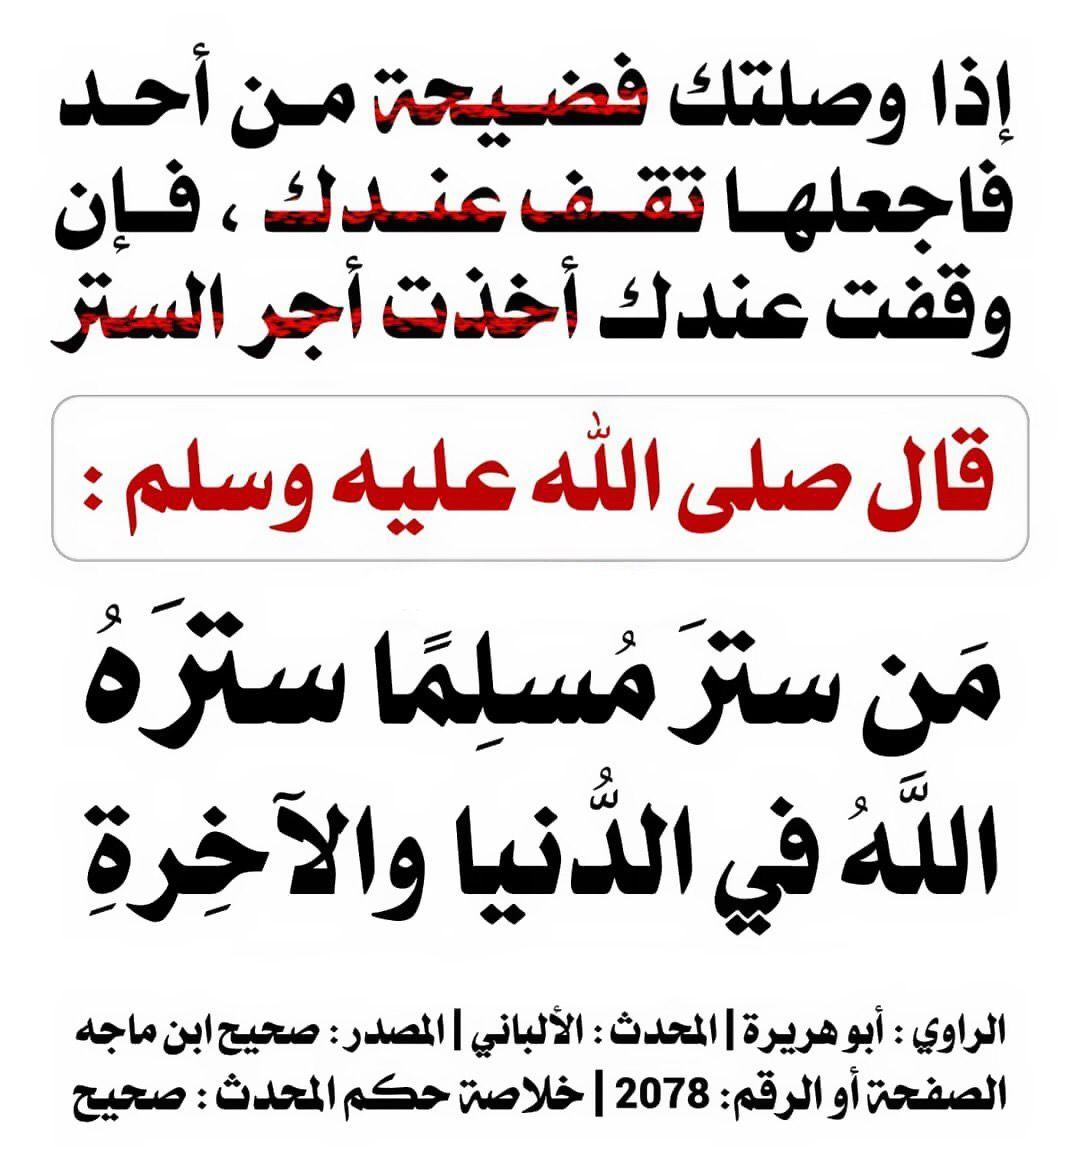 Pin By Amet Allah Dani On أحاديث سيدنا محمد صلى الله عليه وسلم Quran Quotes Inspirational Quran Quotes Ahadith